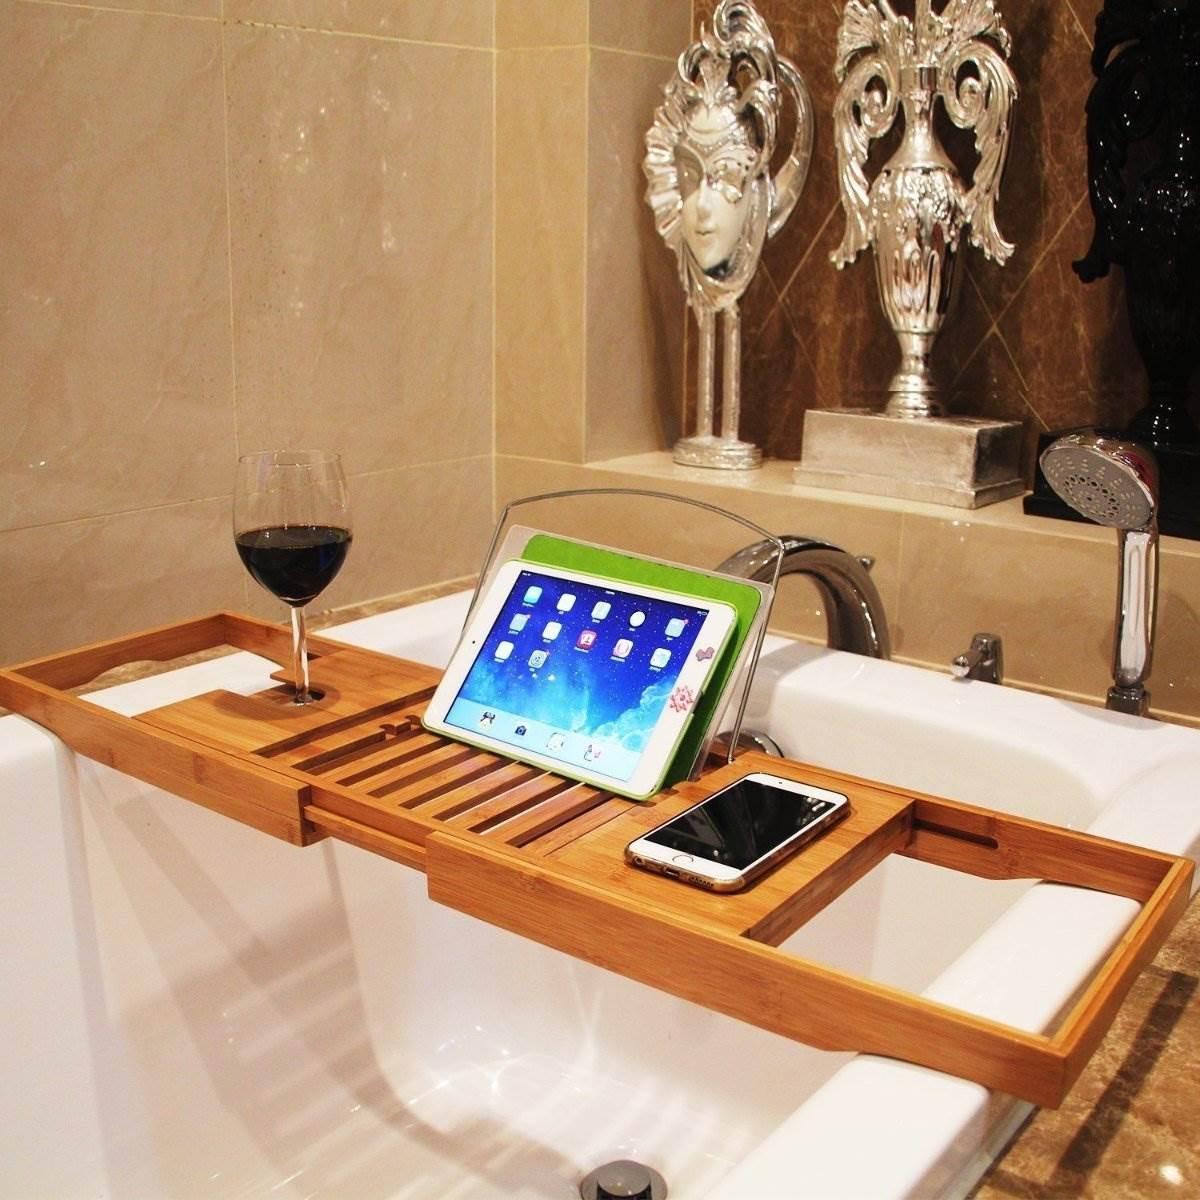 Book Smartphone Shelf Home Bathroom Storage Rack Wooden Adjule Bath Tub Shower Tray Holder Sundries Organizer